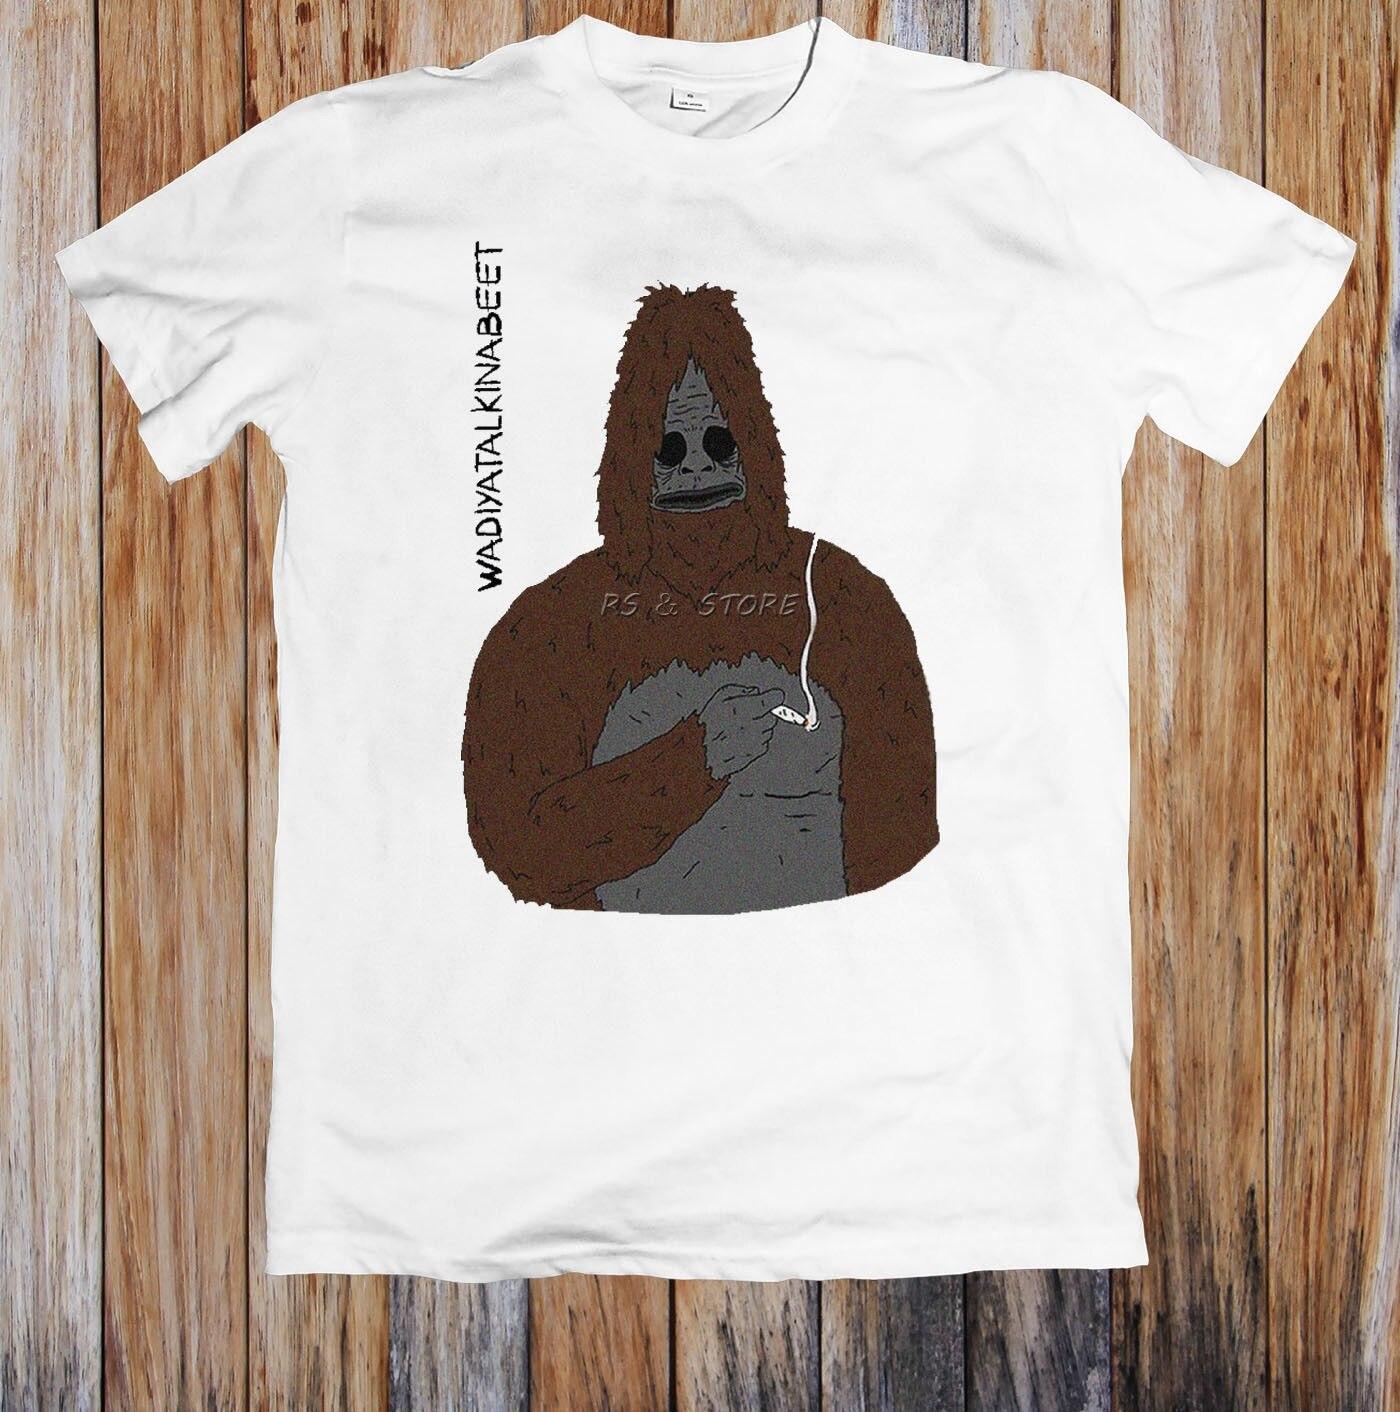 De moda de Verano de la calle manga corta T camisa atrevida el SASQUATCH gran LEZ mostrar oficial camiseta UNISEX de moda de verano T-Shirt